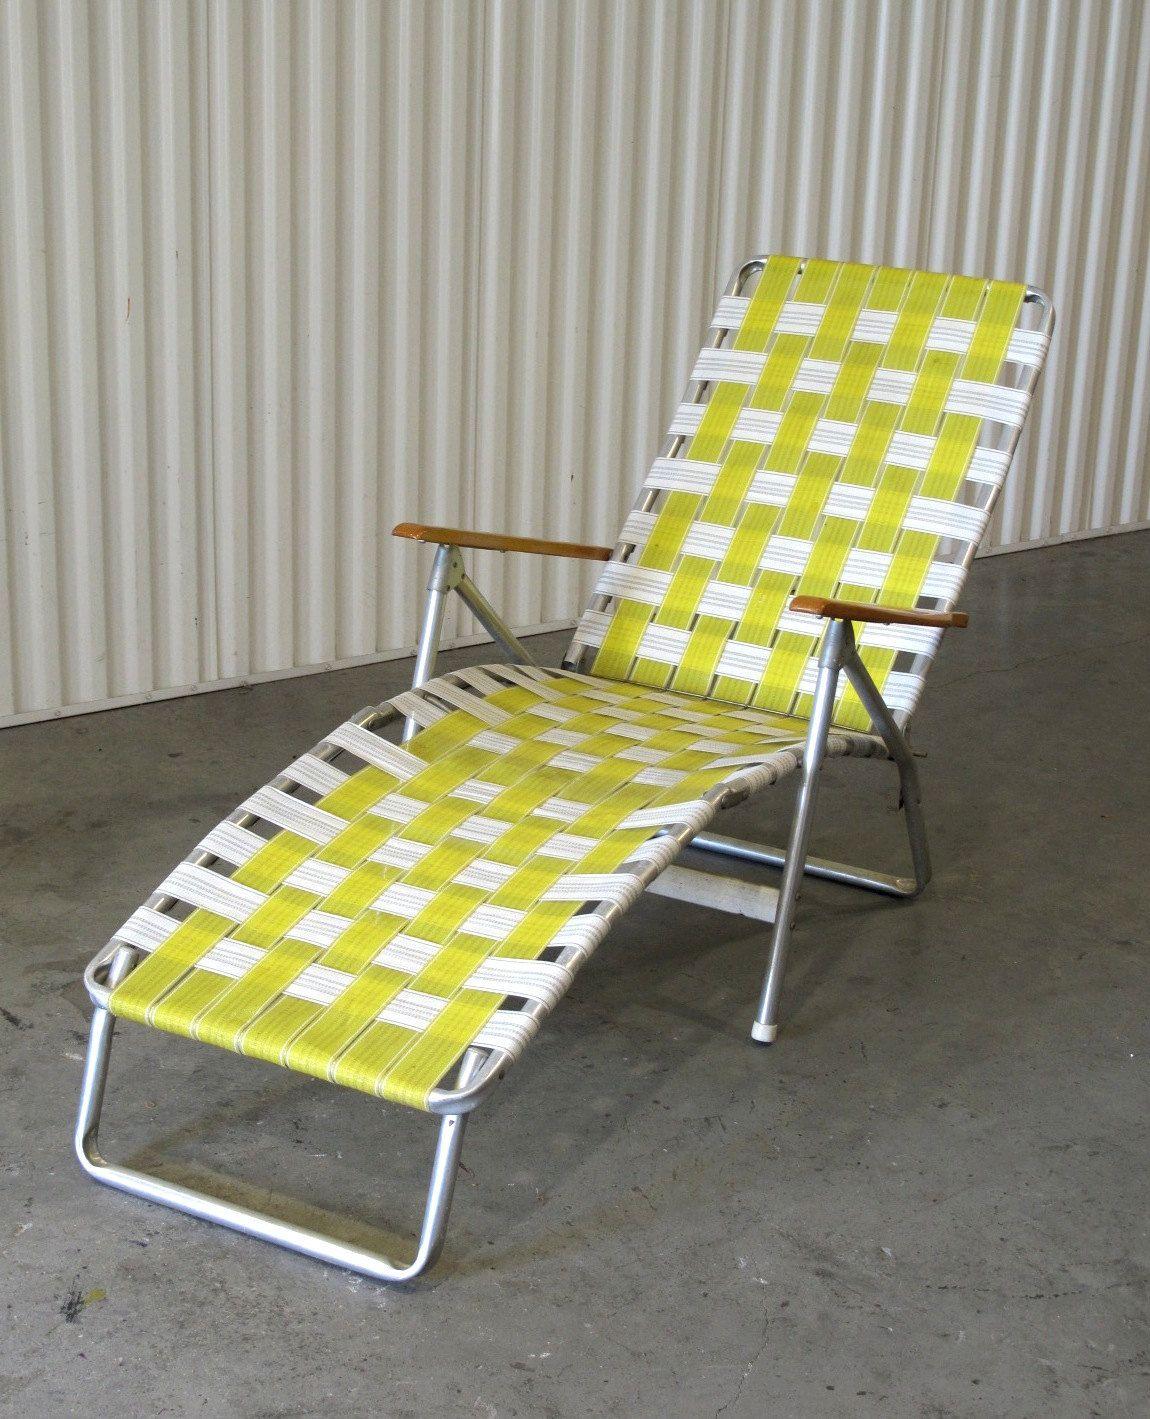 Vintage folding beach chairs - 1960 S Yeller Chair Lawn Chairsbeach Chairsvintage Stuff